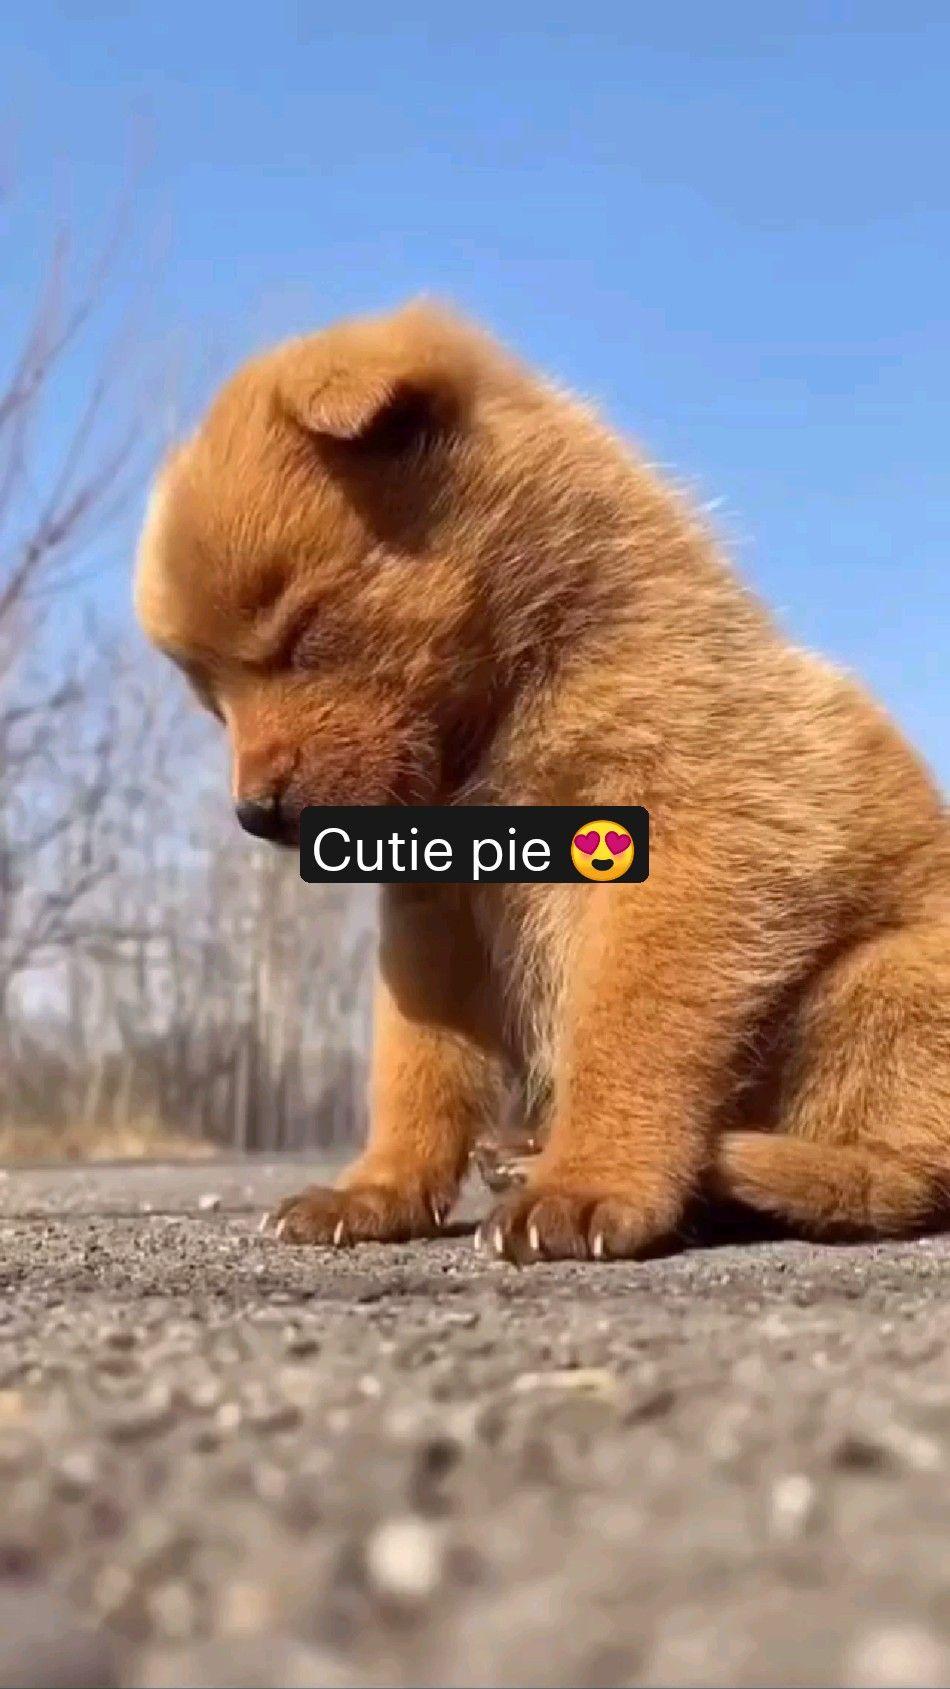 Cutie pie 😍